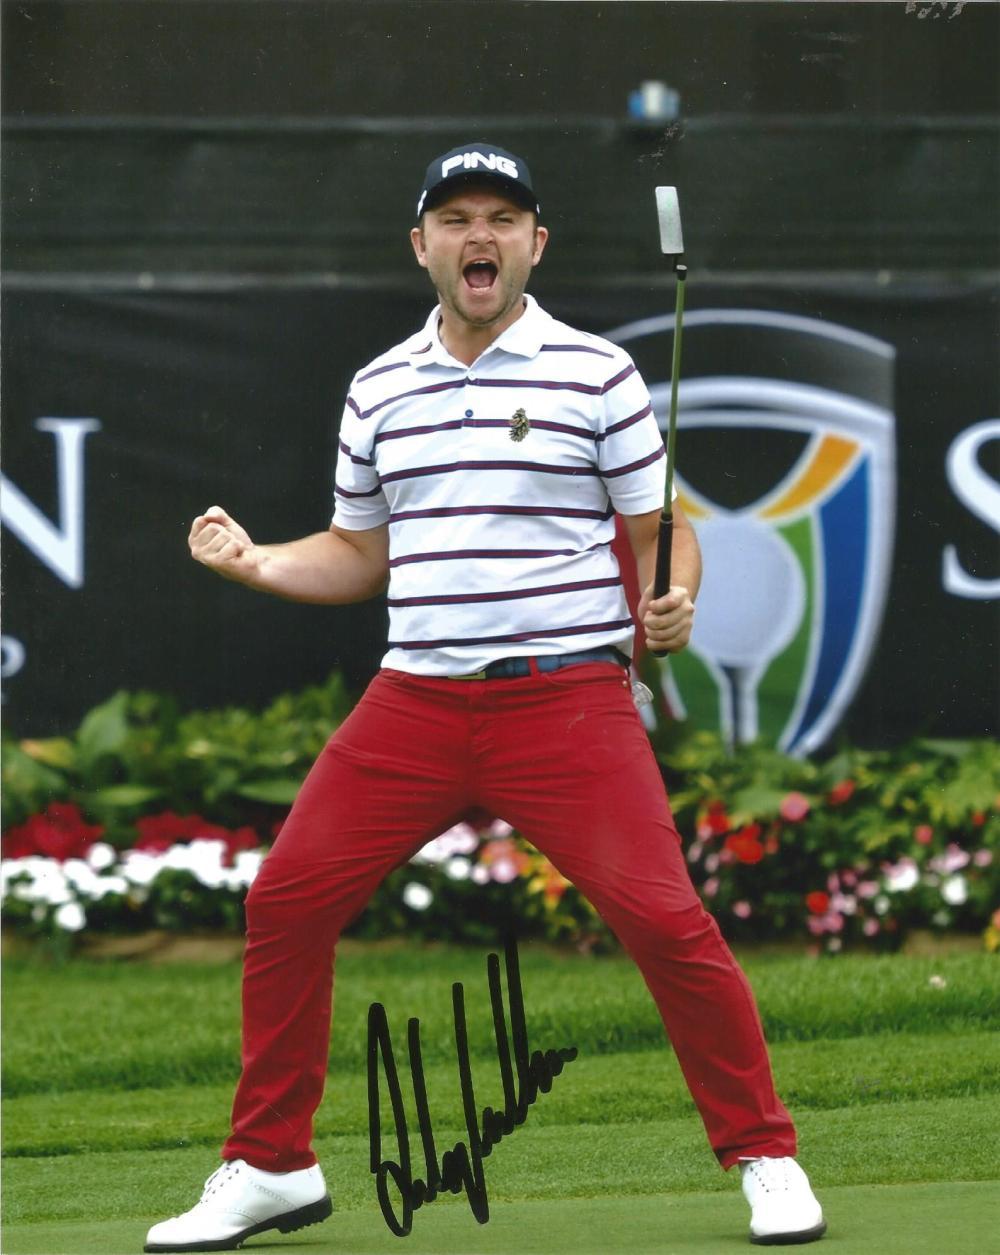 Andy Sullivan Signed Golf 8x10 Photo. Good Condition Est.